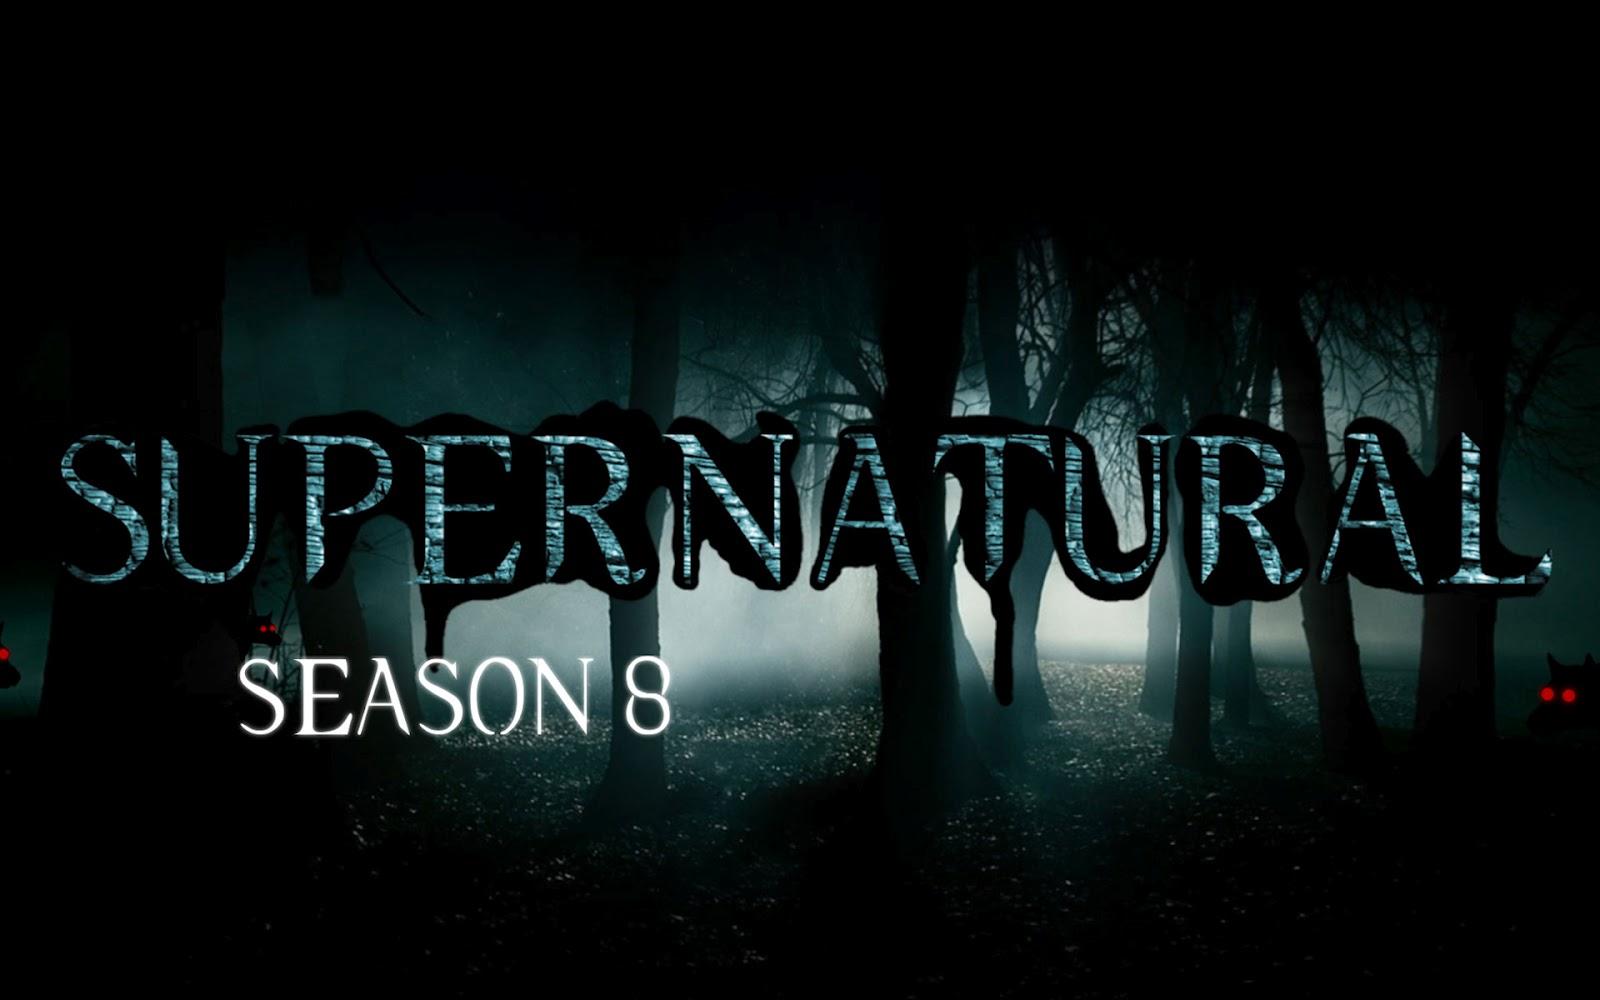 http://4.bp.blogspot.com/-jLCYUcfyeqU/UGcoDvLTCHI/AAAAAAAAGrM/IO9HmZCB-zY/s1600/supernatural_season_8_wallpaper.jpg